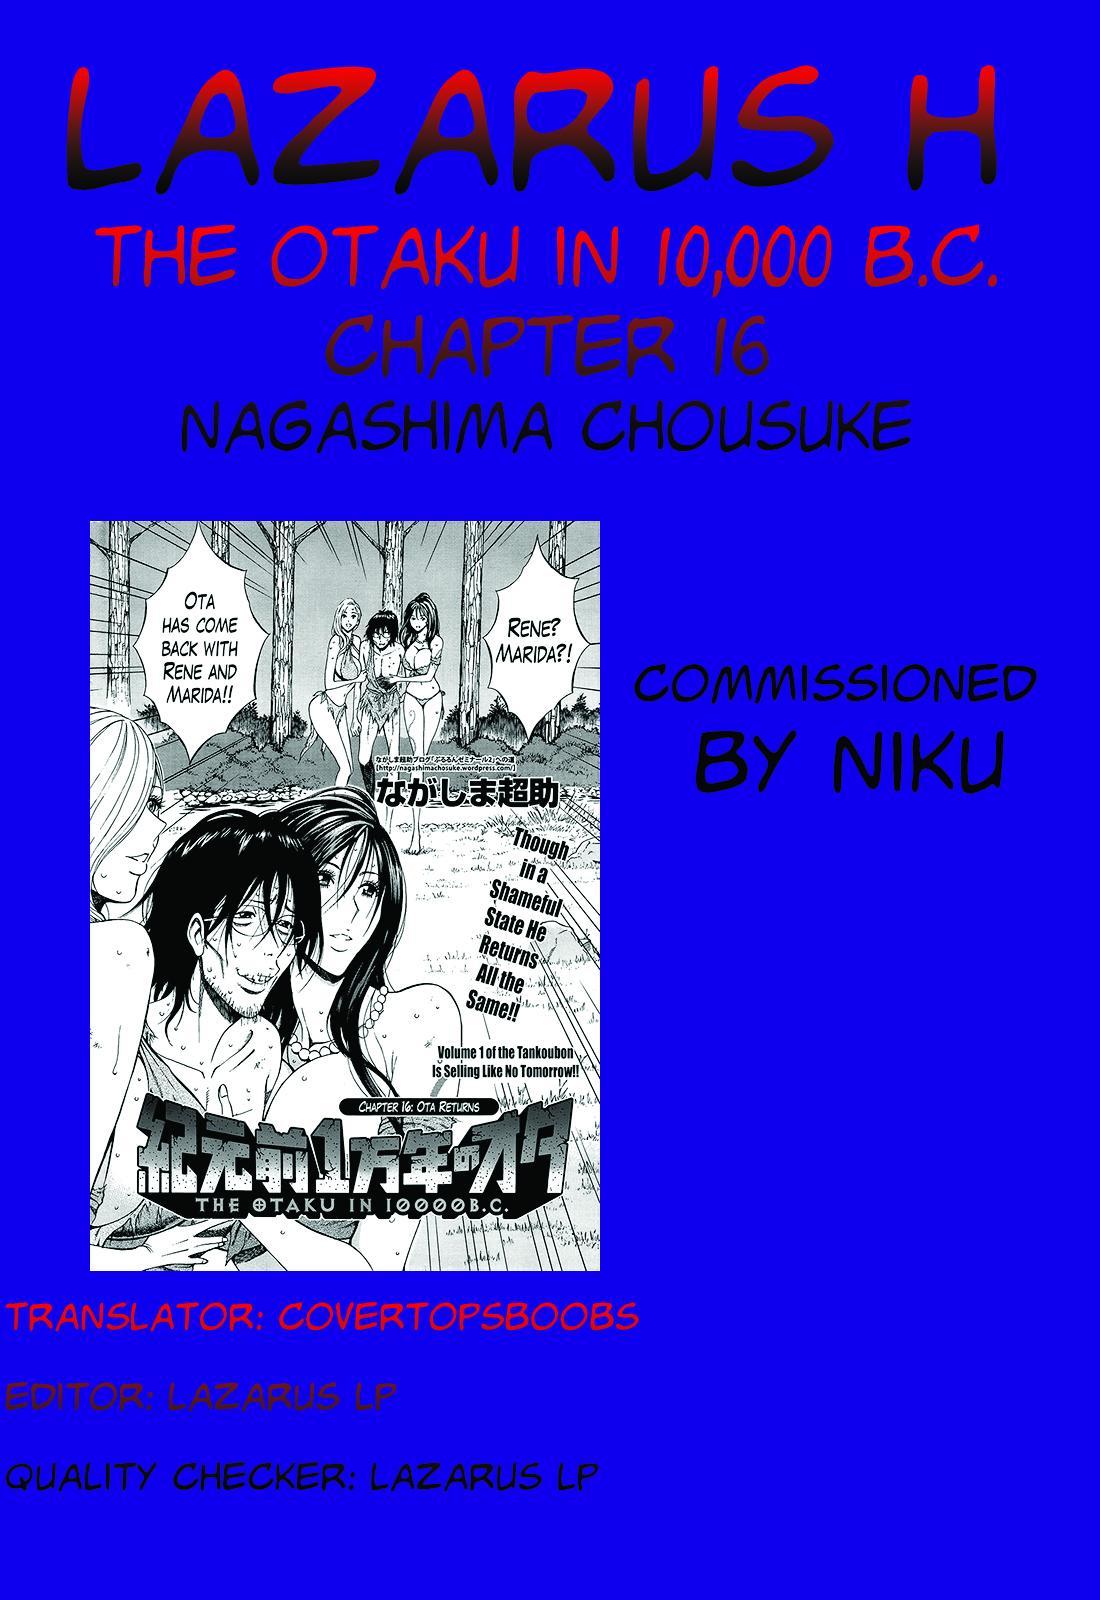 Kigenzen 10000 Nen no Ota   The Otaku in 10,000 B.C. Ch. 1-22 308